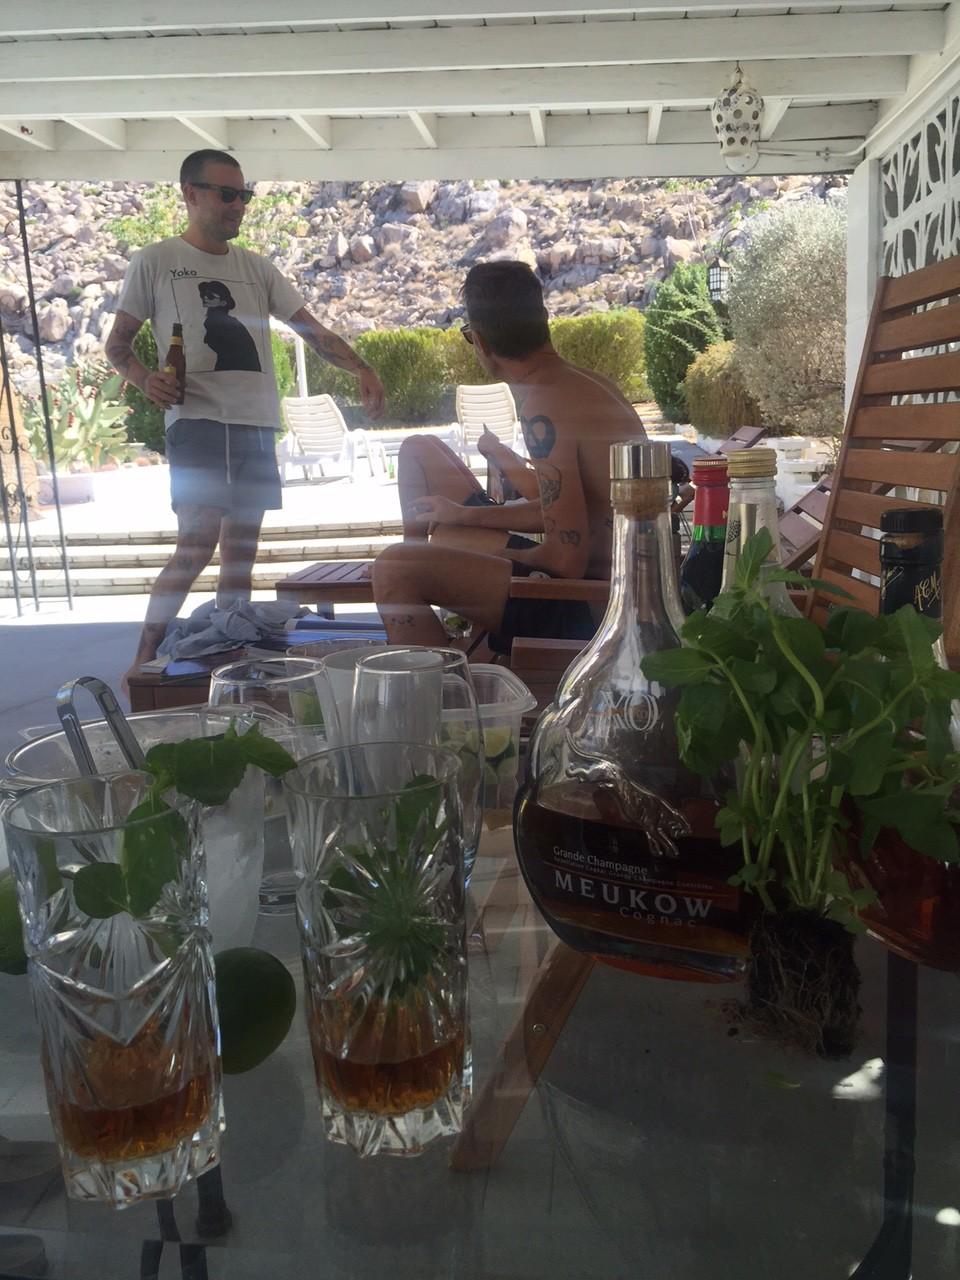 Sophie's Meukow Cognac Cocktails from California